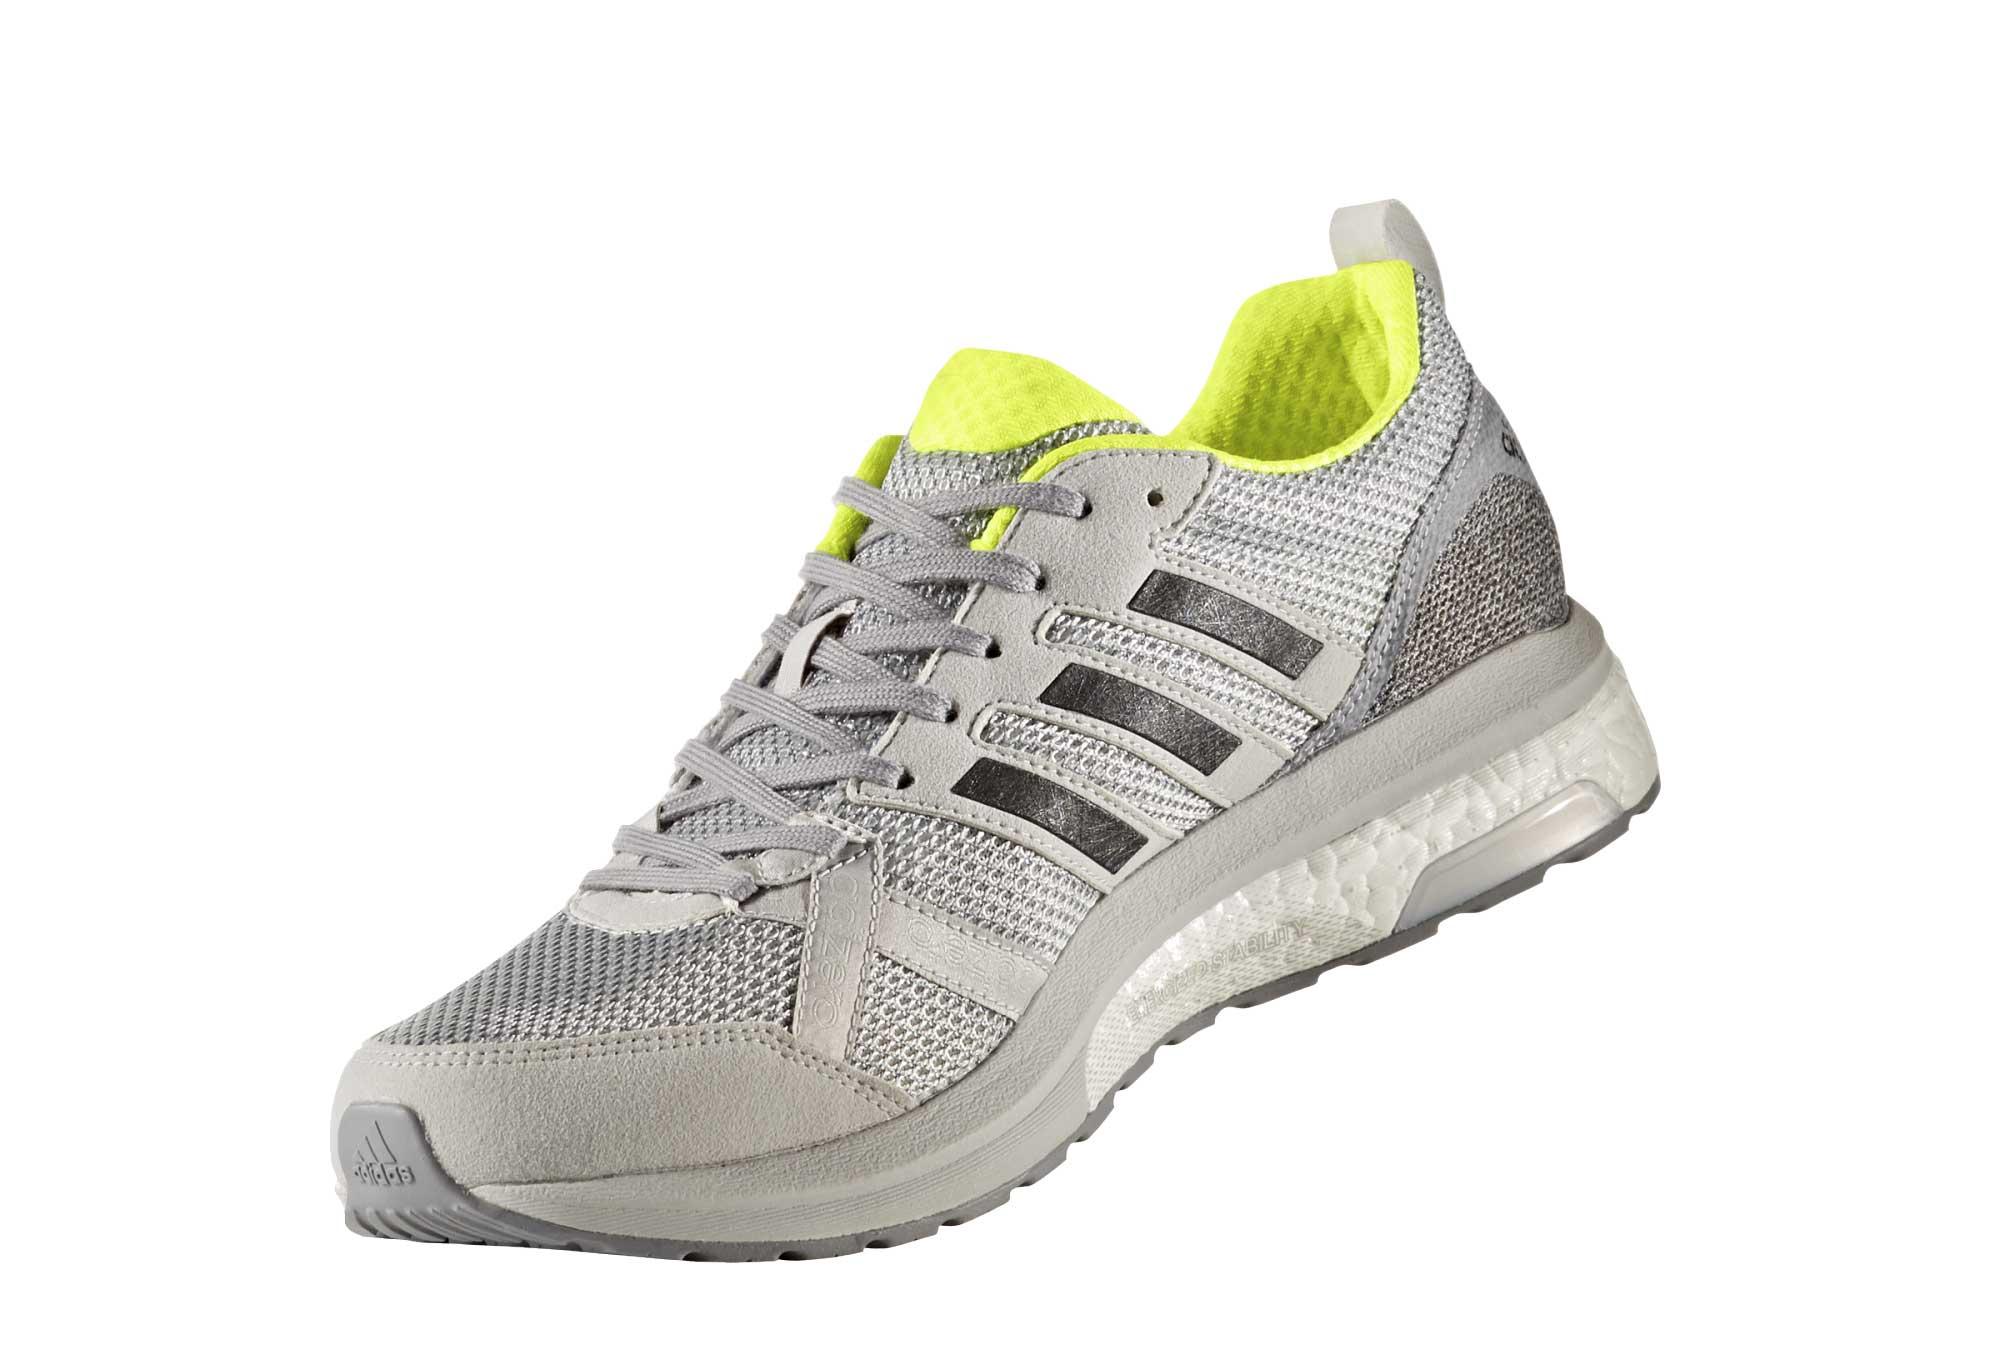 finest selection e8fc4 f1e85 Chaussures de Running adidas running Adizero Tempo 9 Gris  Jaune  Fluo